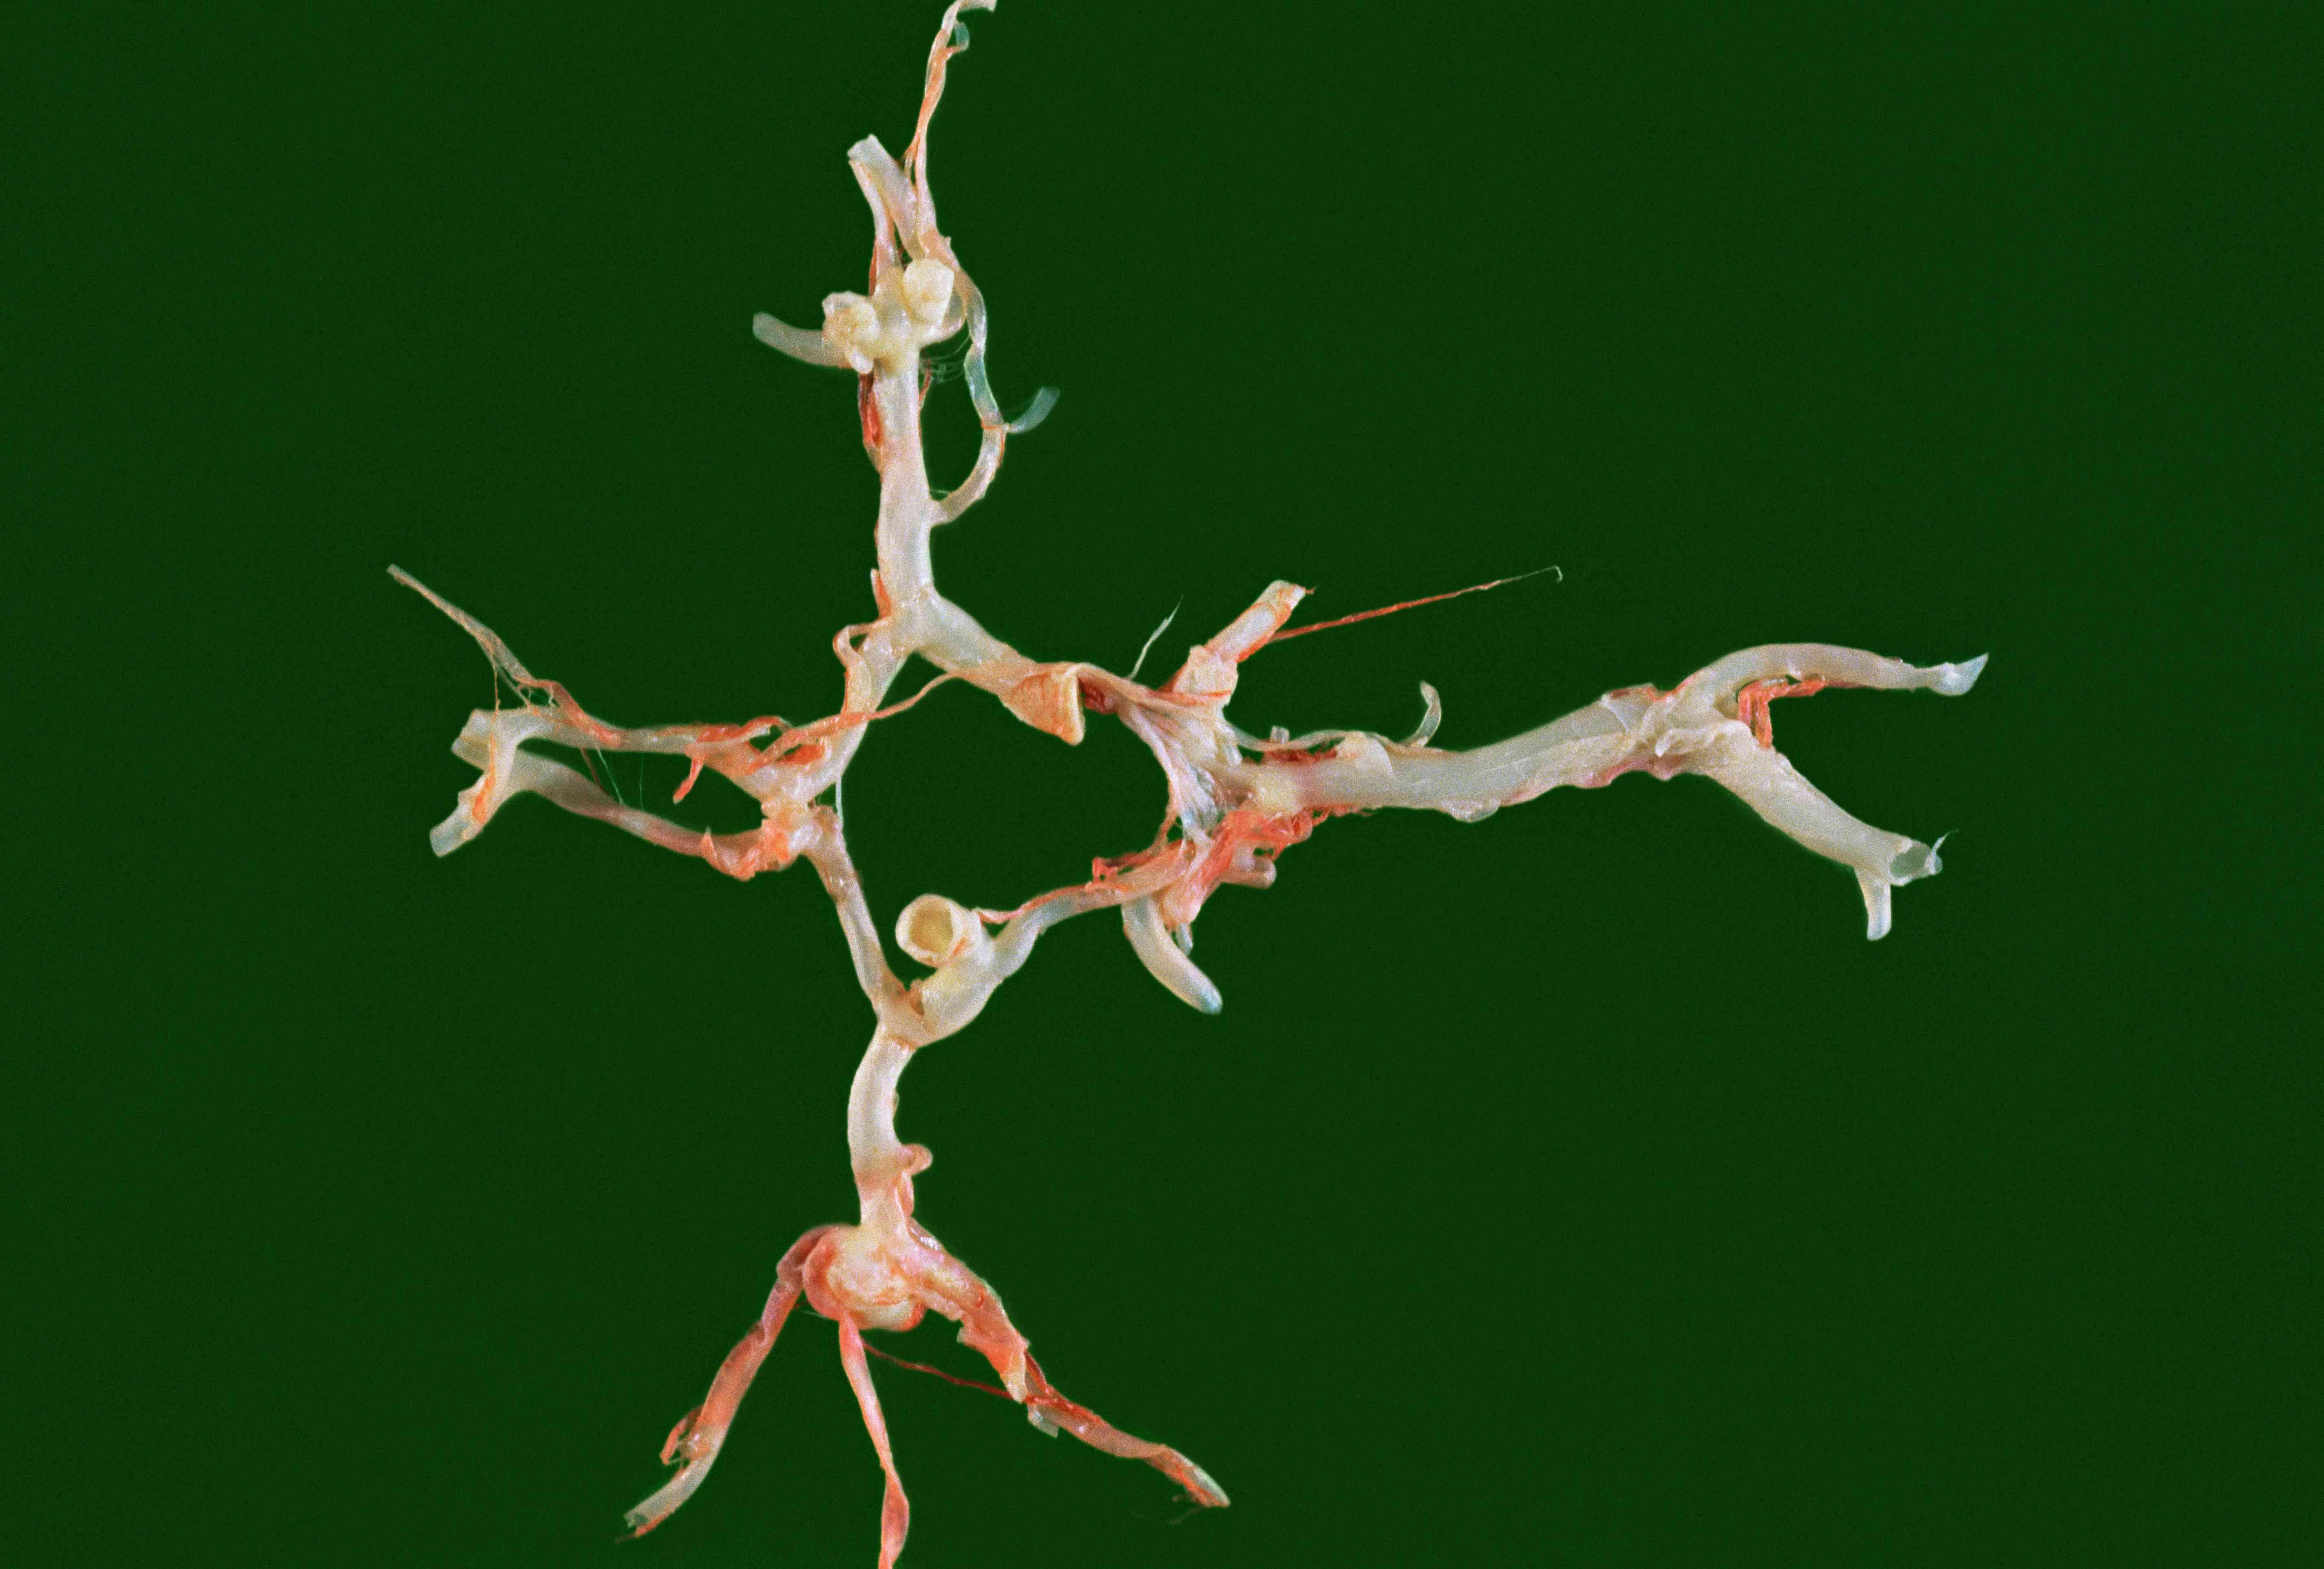 Berry aneurysm illustration